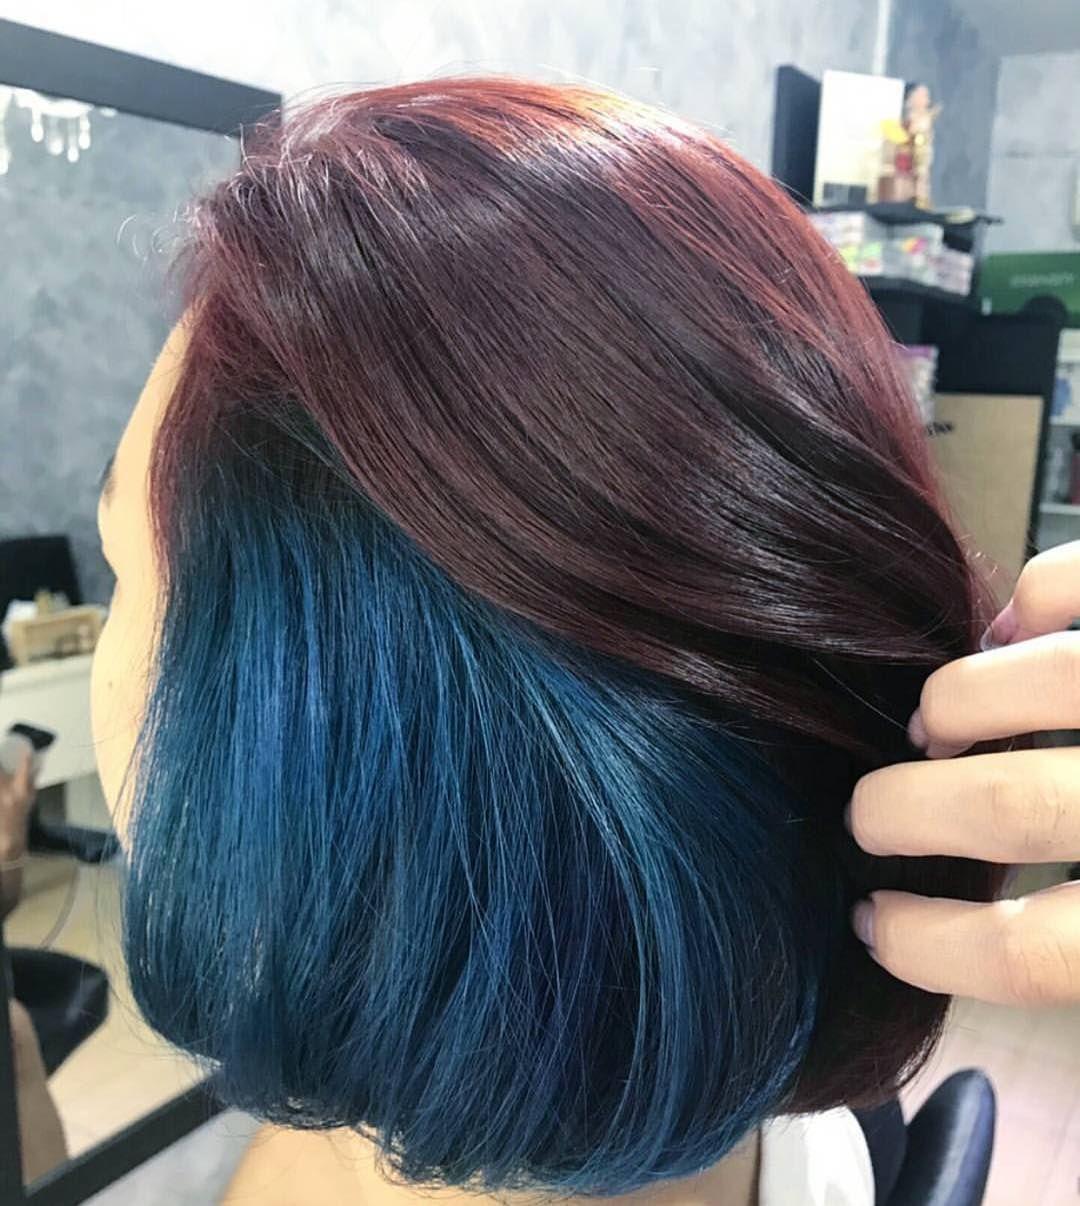 3 349 Likes 118 Comments Distributor Pravana Indonesia Pravanaindonesia On Instagram W Pravana Hair Color Bun Hairstyles For Long Hair Long Hair Styles